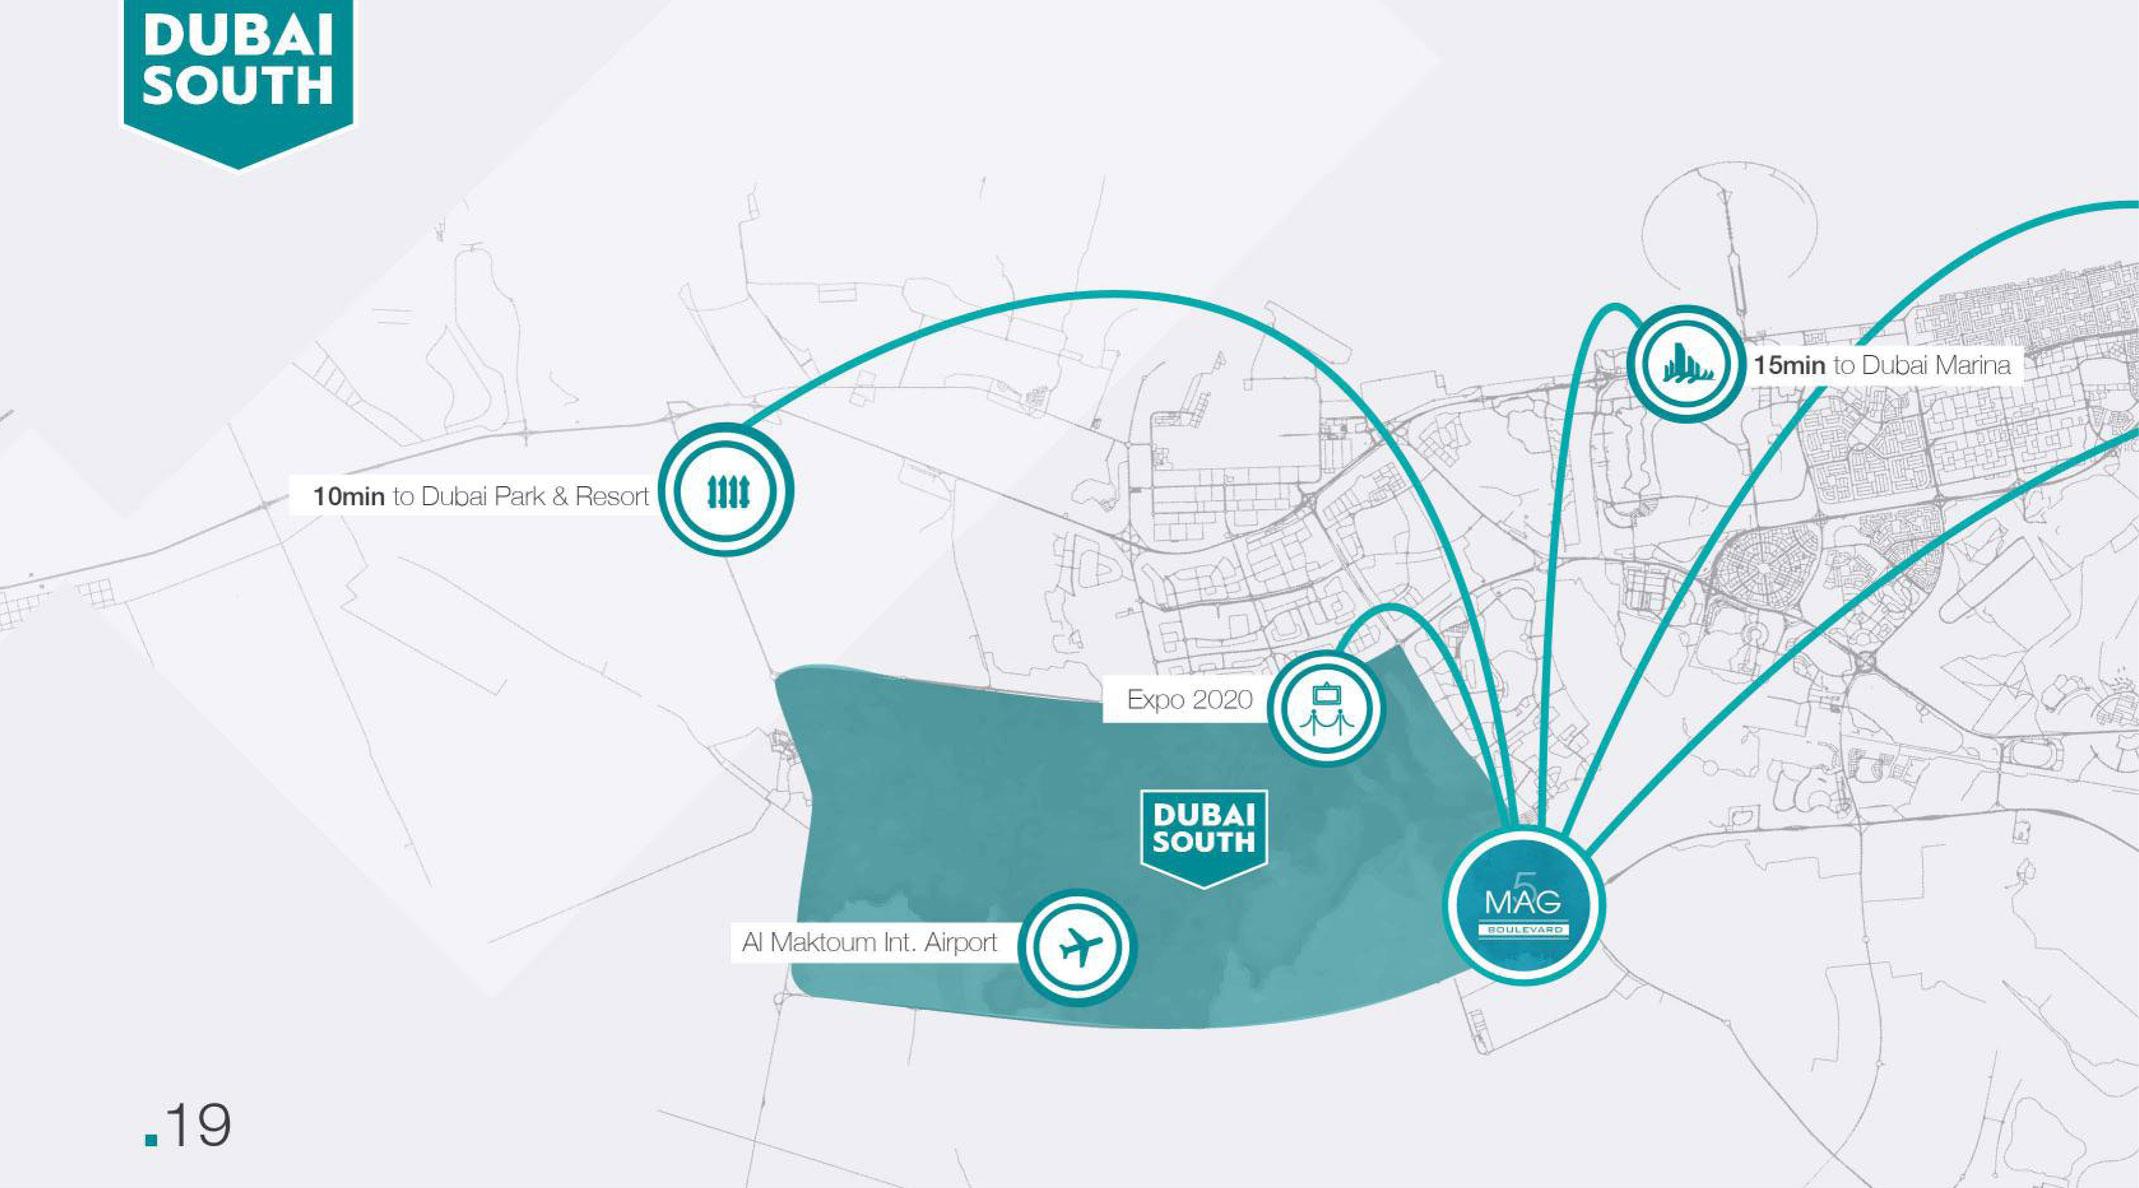 MAG 5 Boulevard -  Location Plan